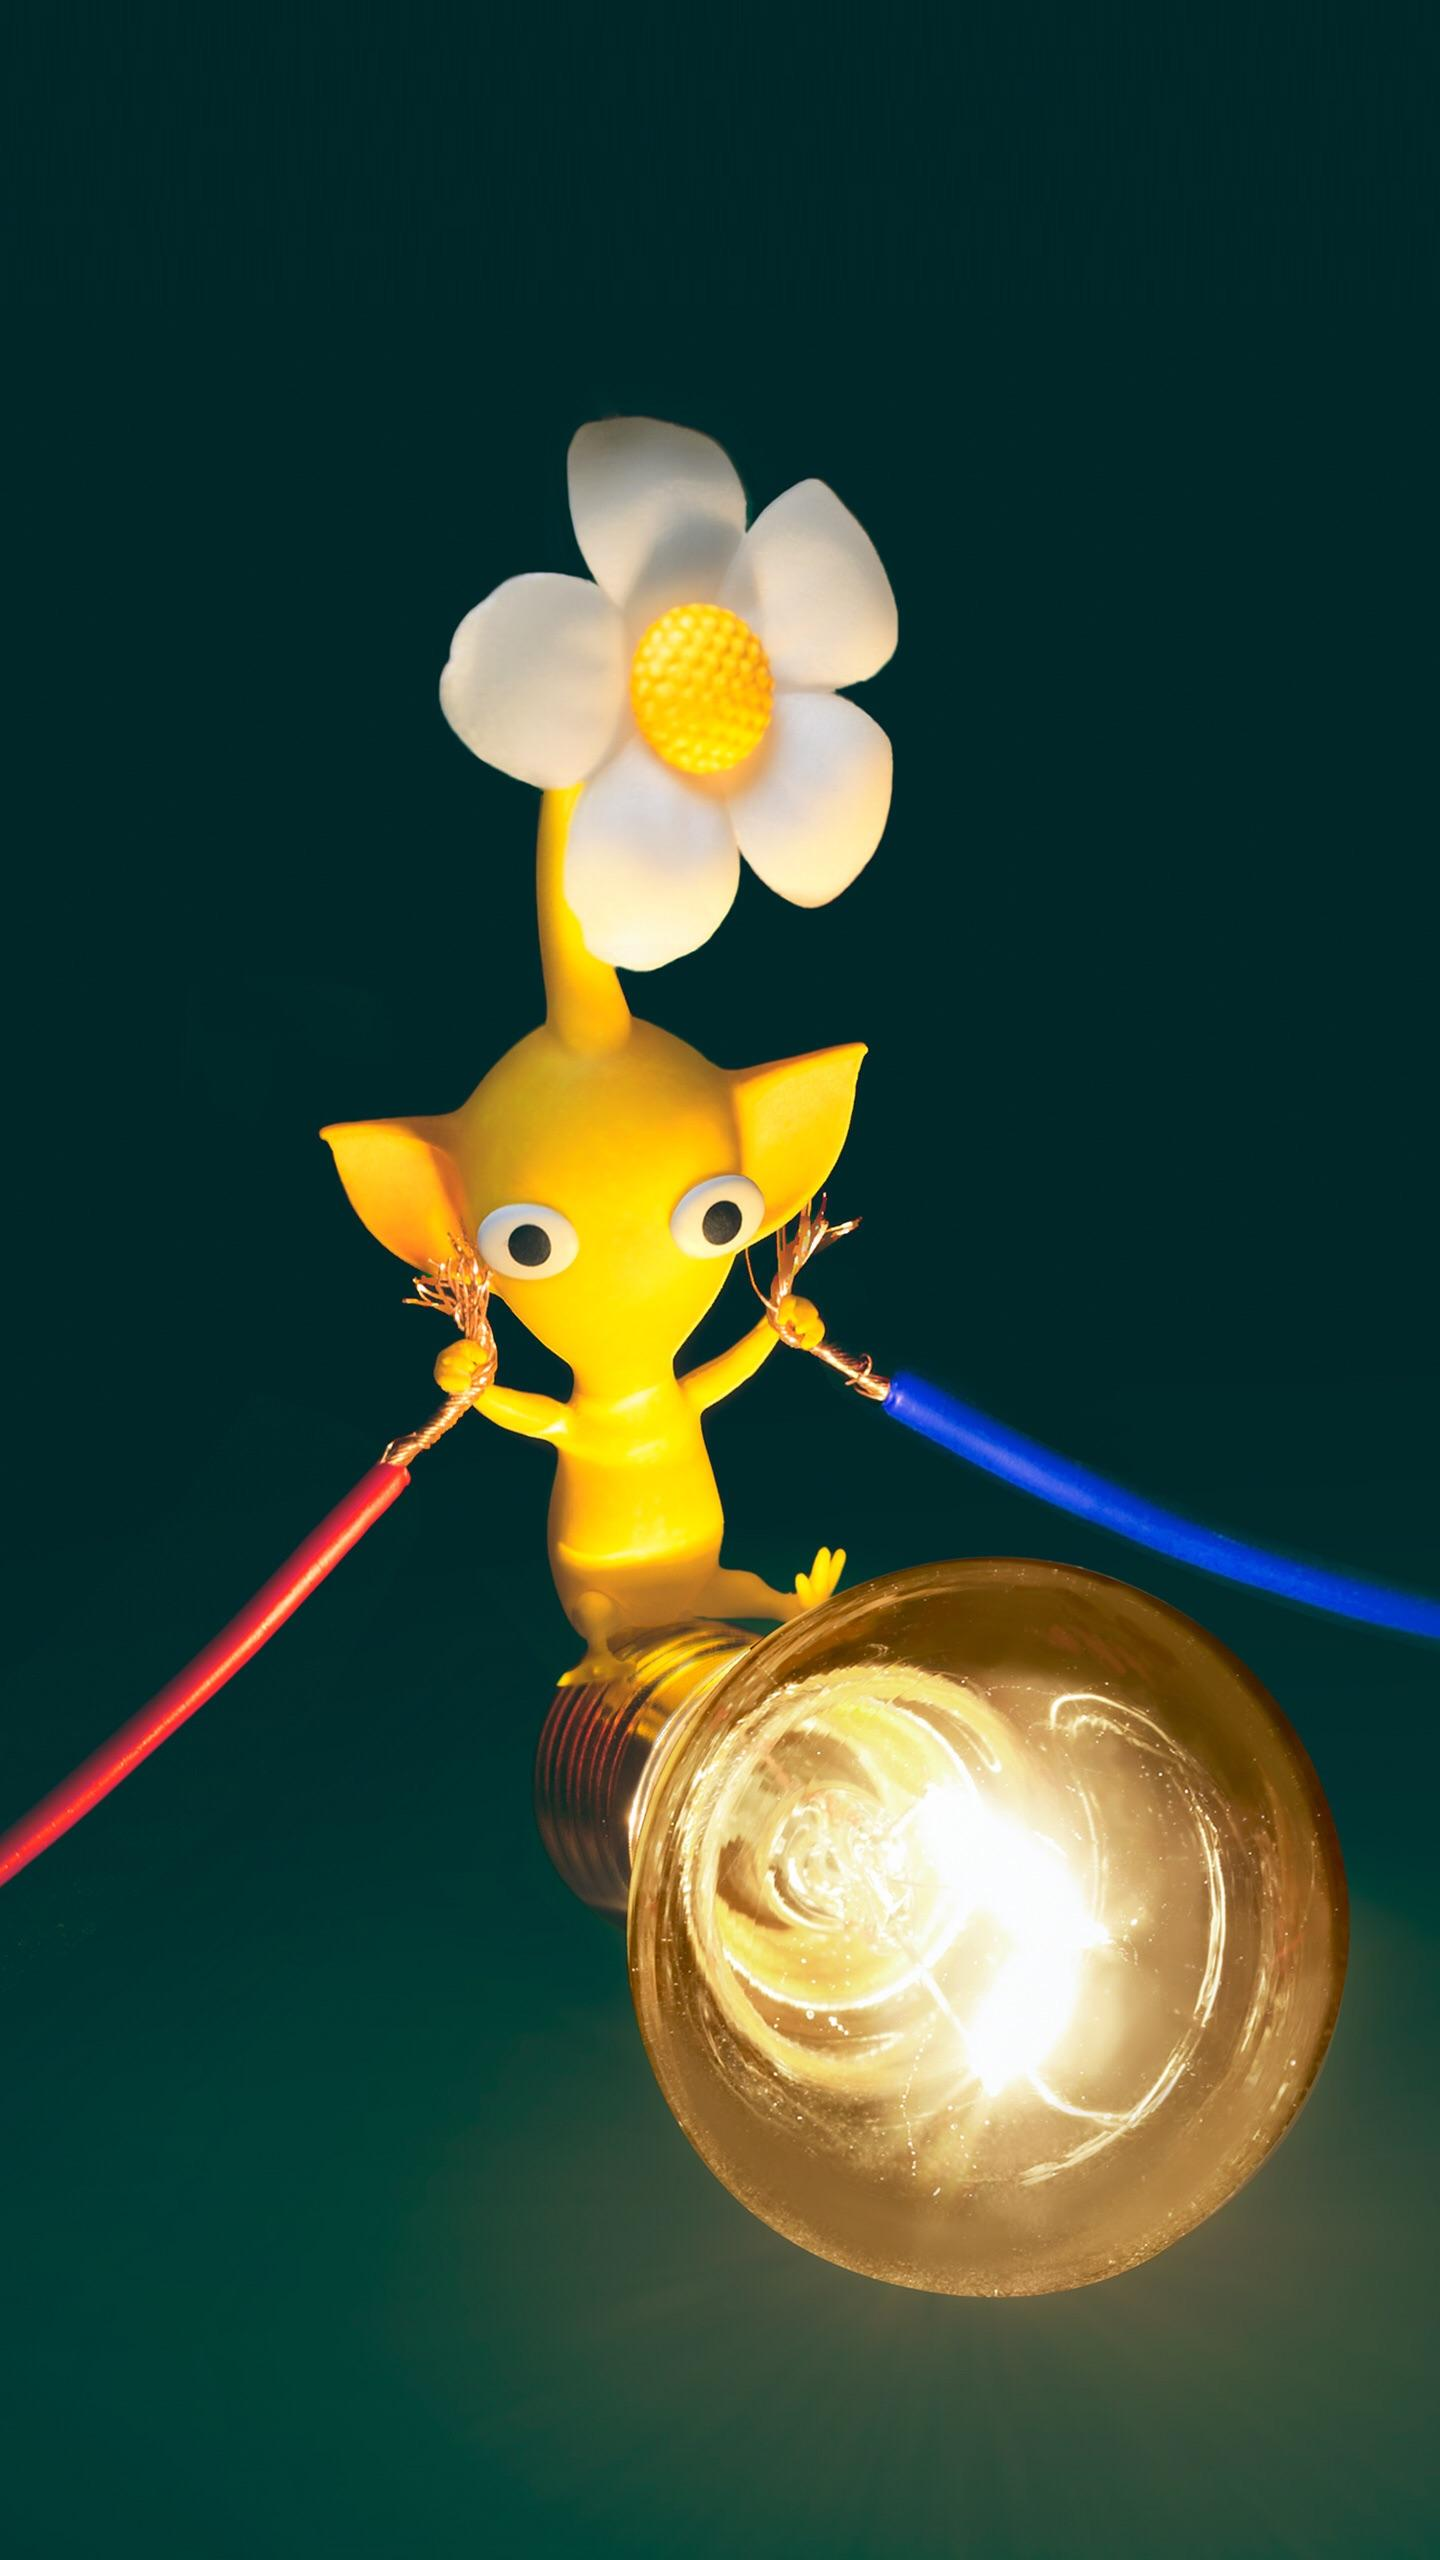 Yellow Pikmin Wallpaper from My Nintendo Pikmin 1440x2560